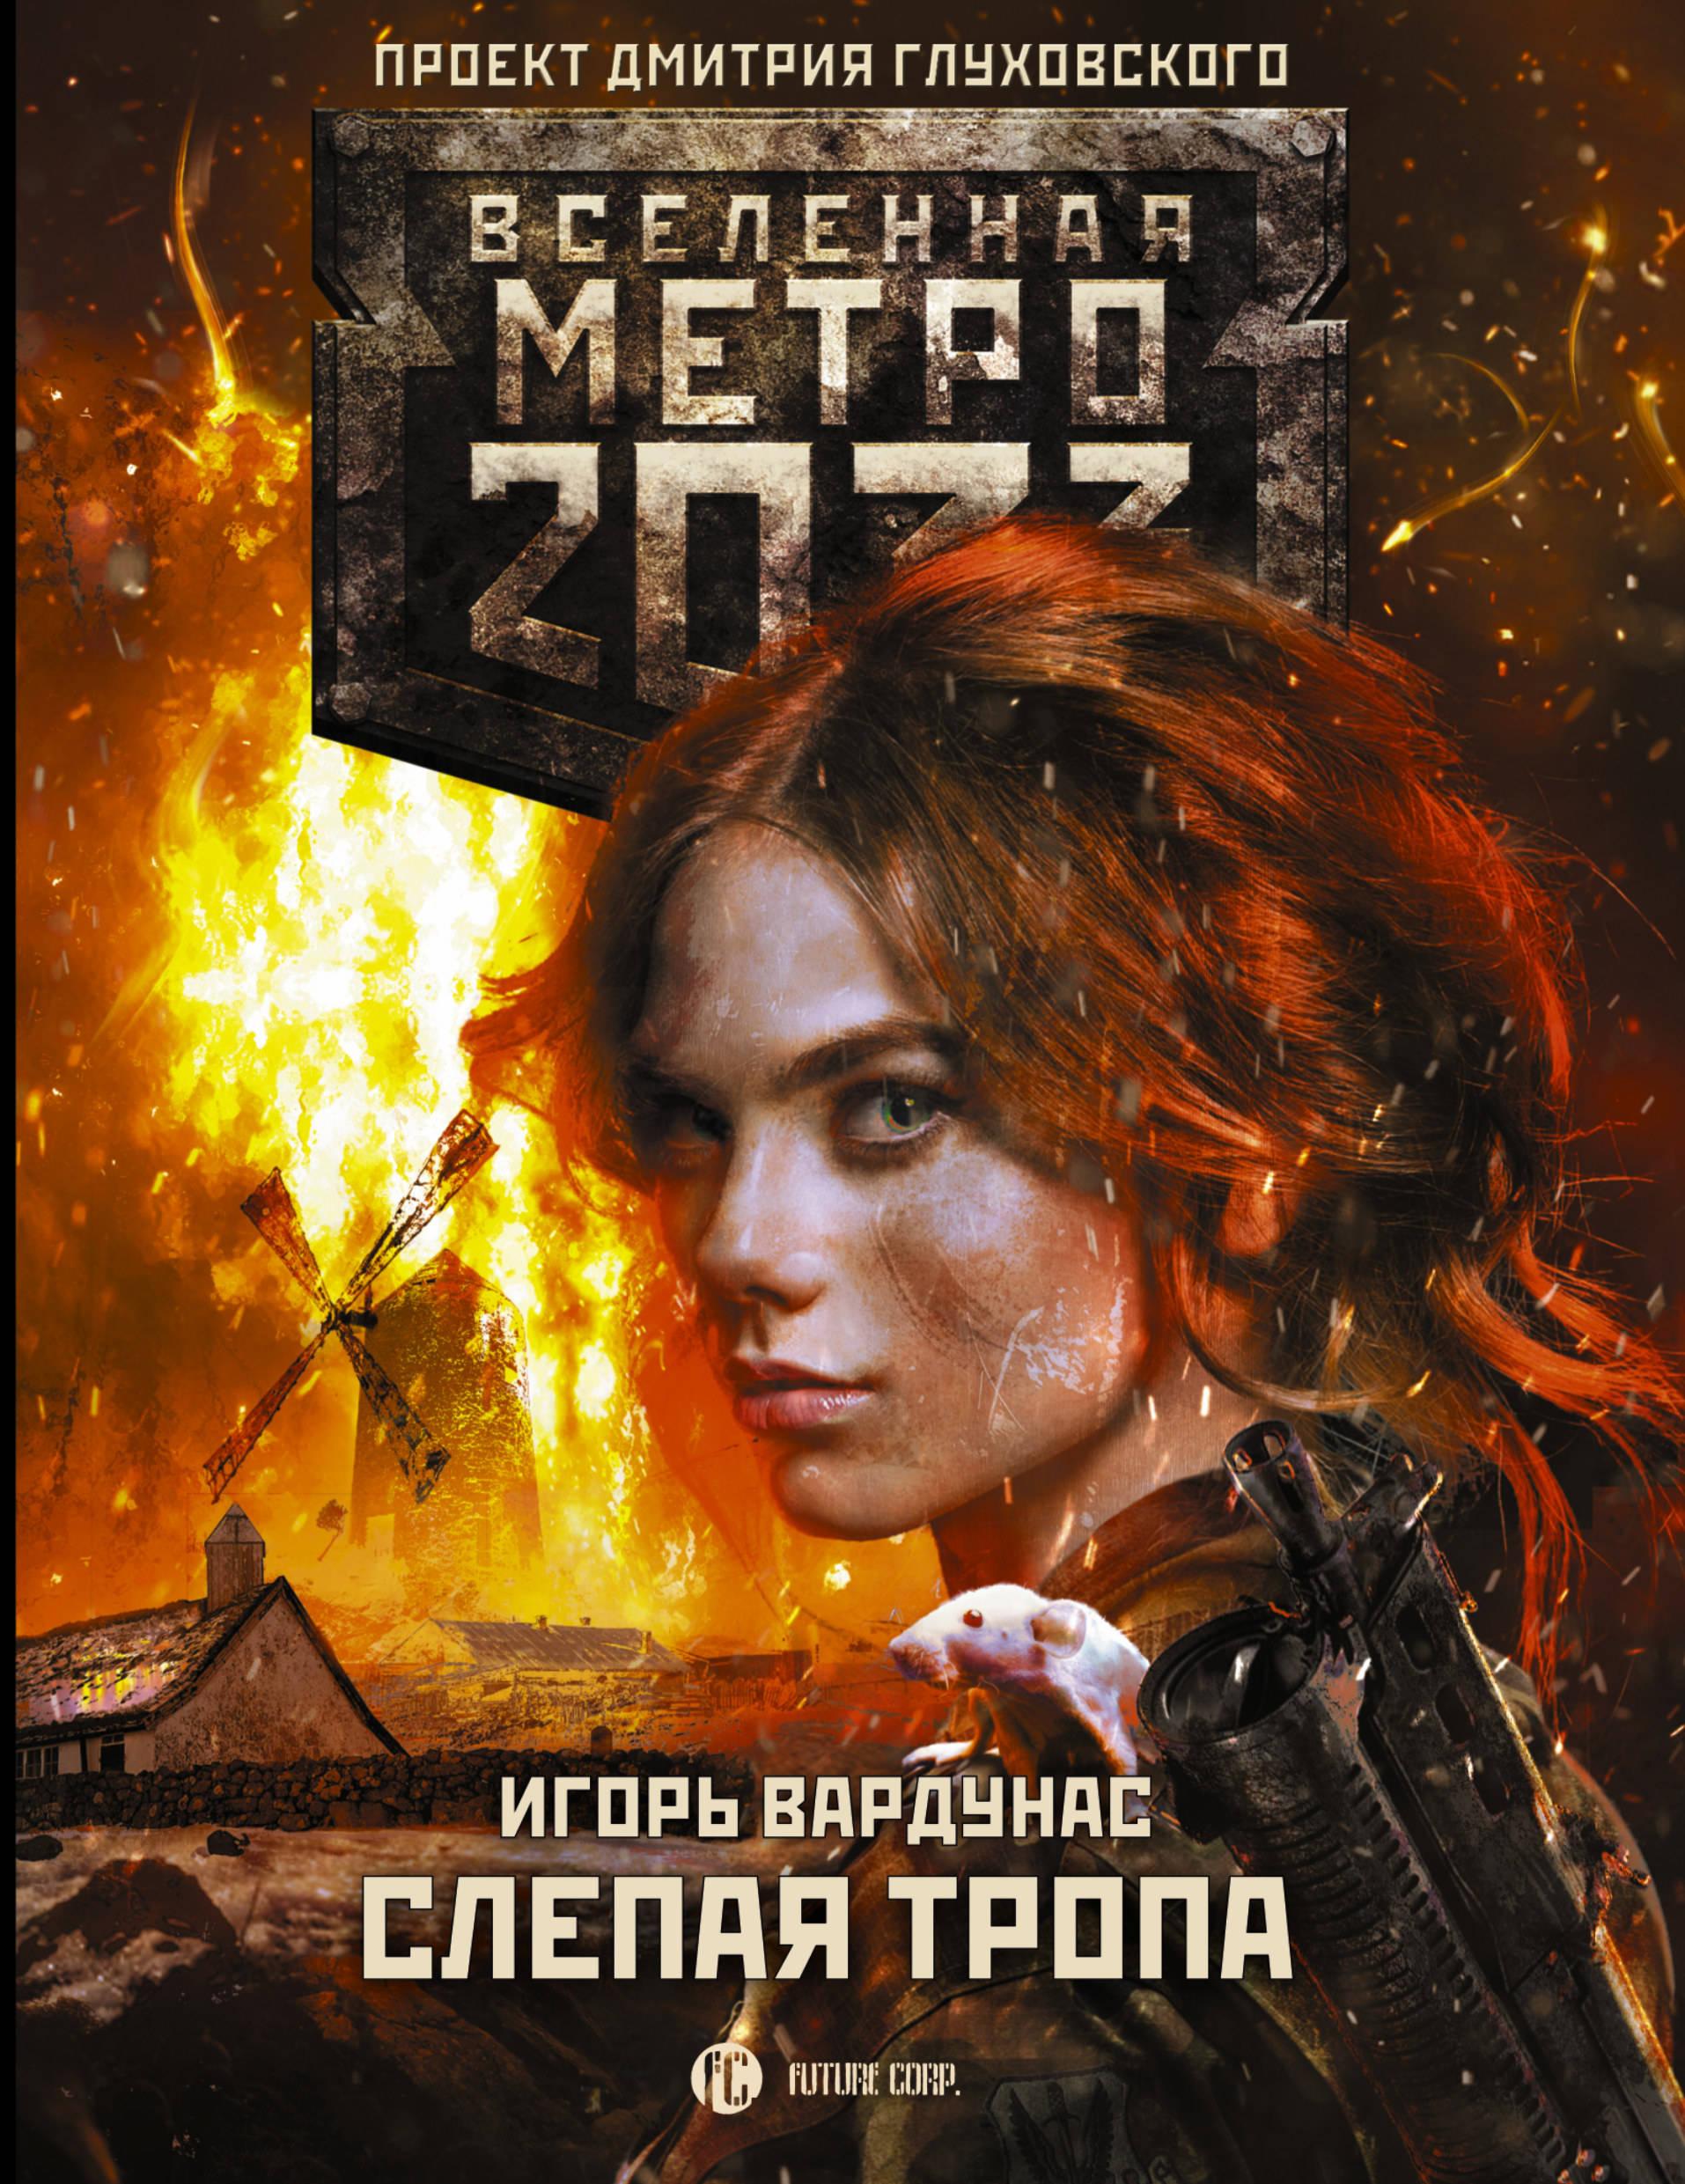 Metro 2033: Slepaja tropa